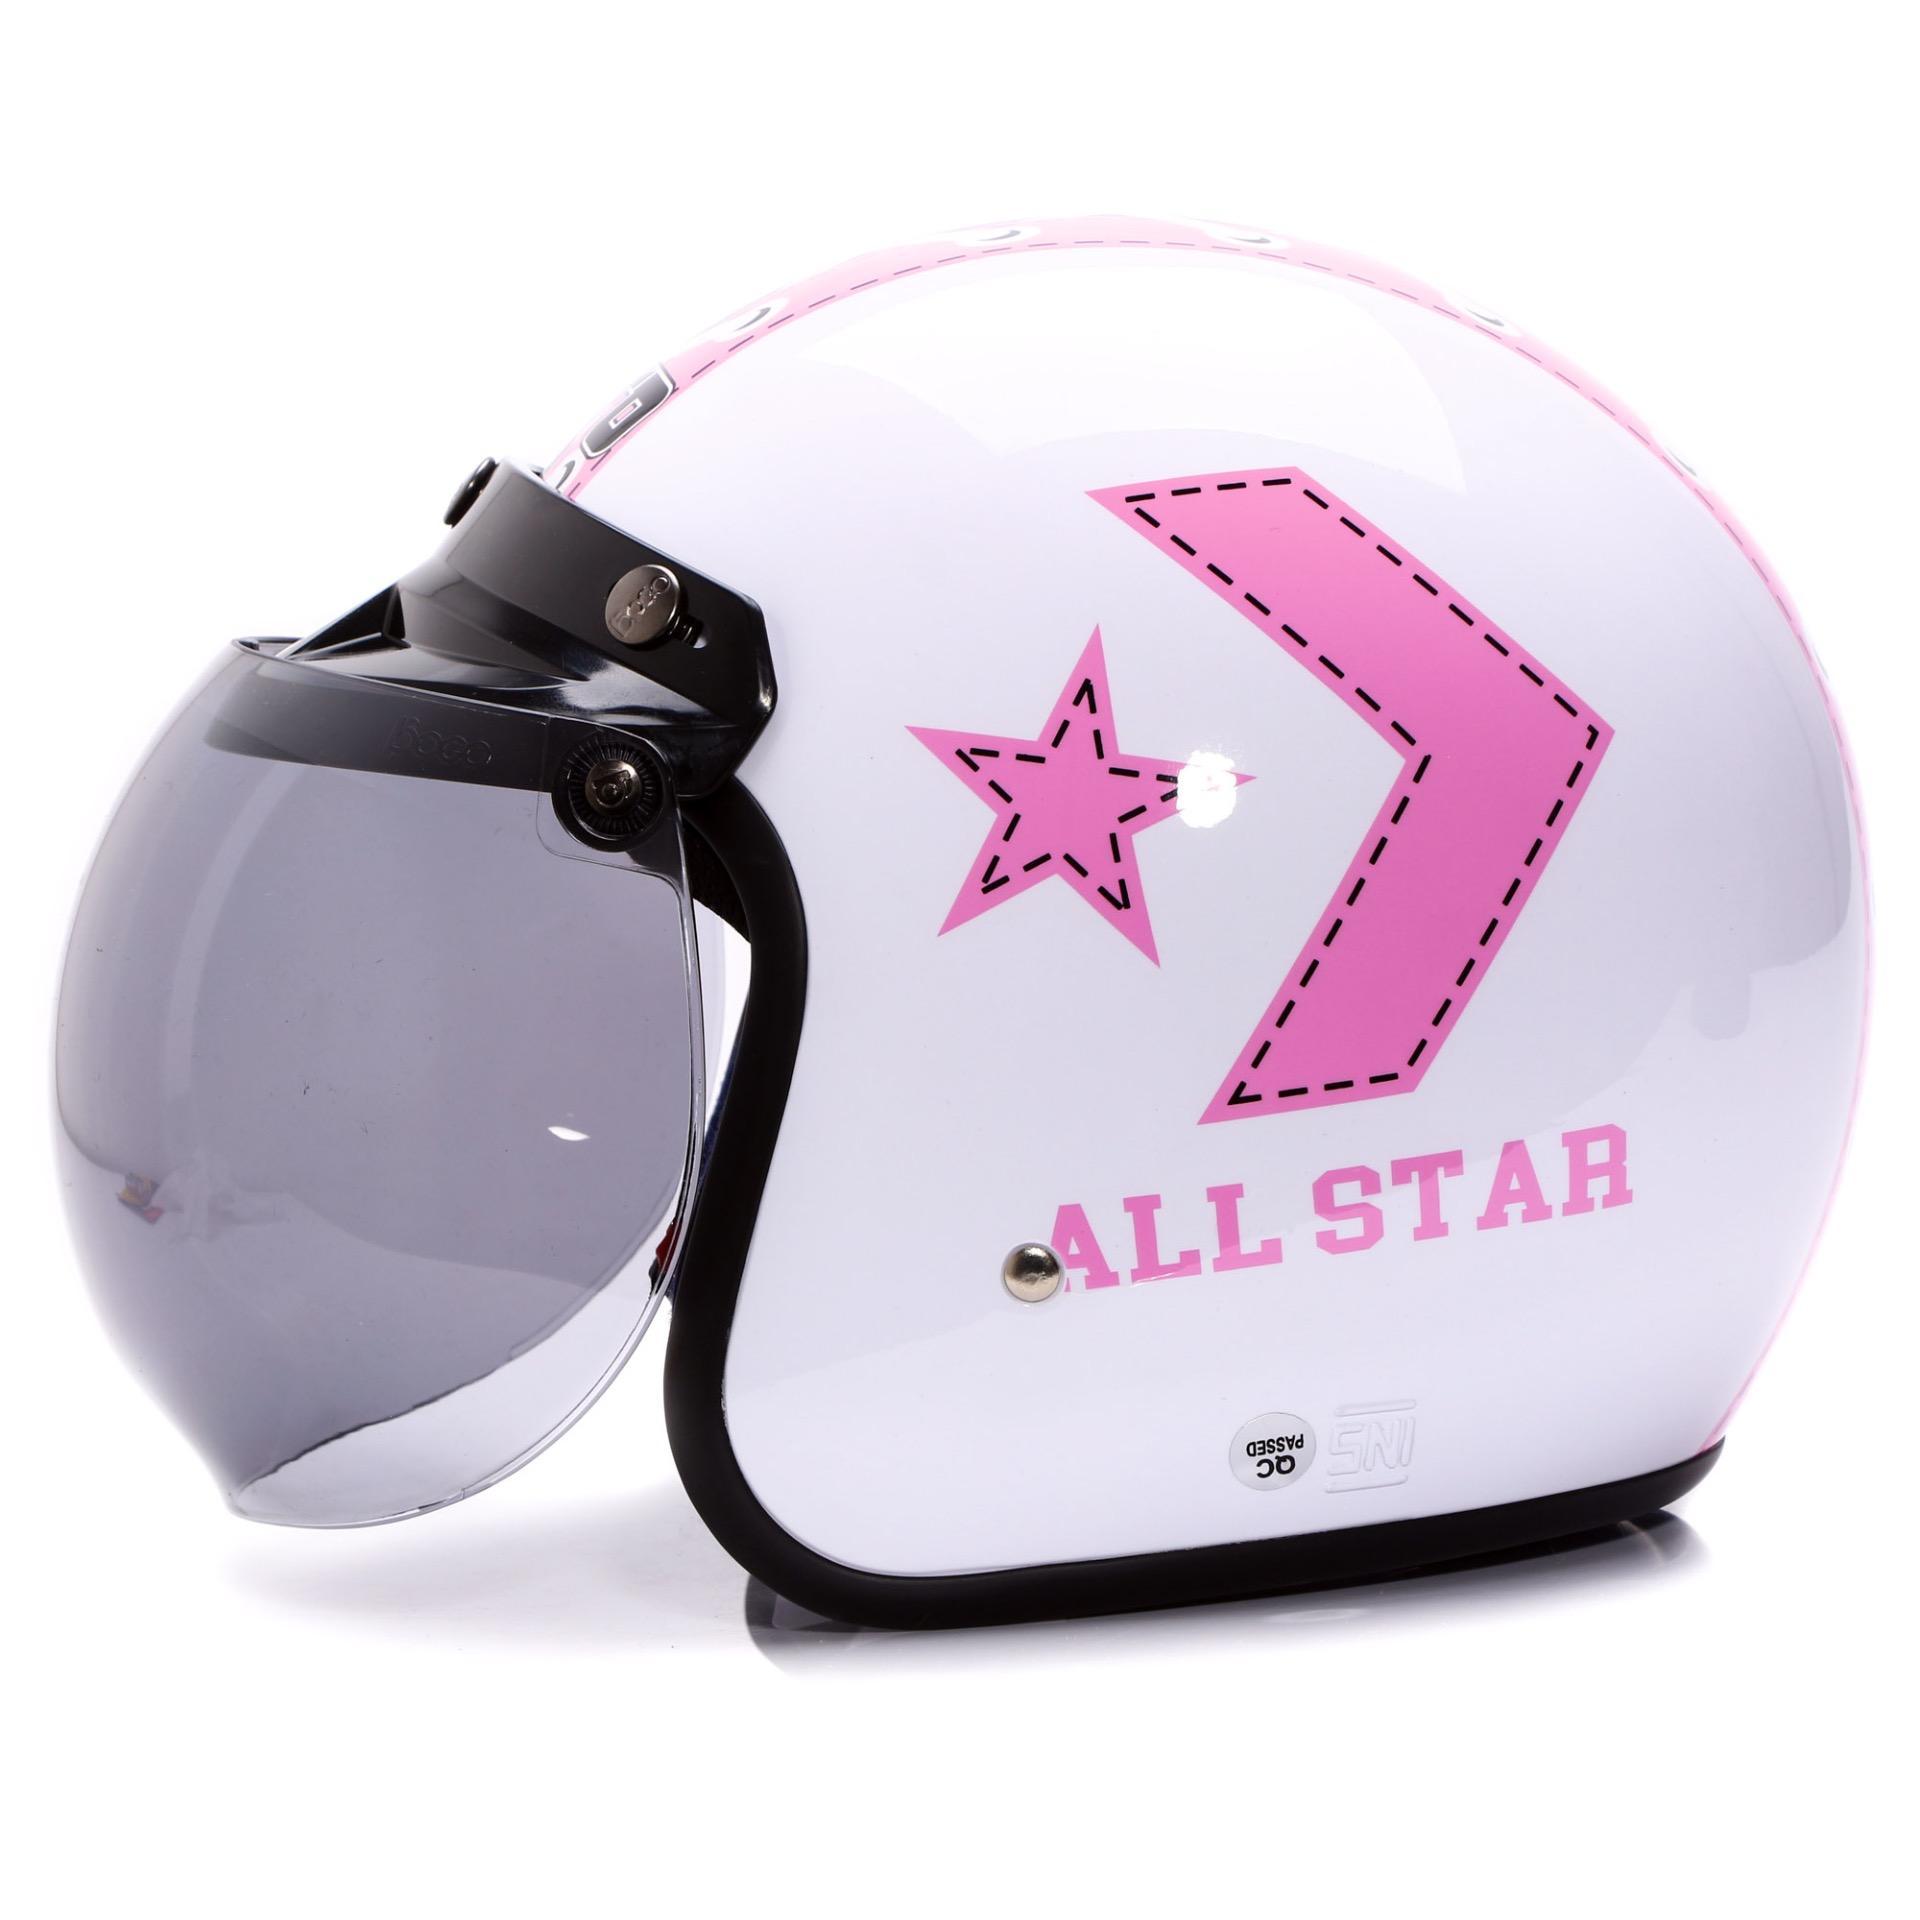 Wto Helmet Retro Bogo All Star Hitam Merah Daftar Harga Penjualan Junior Neo Rapunzel Ungu Putih Pink